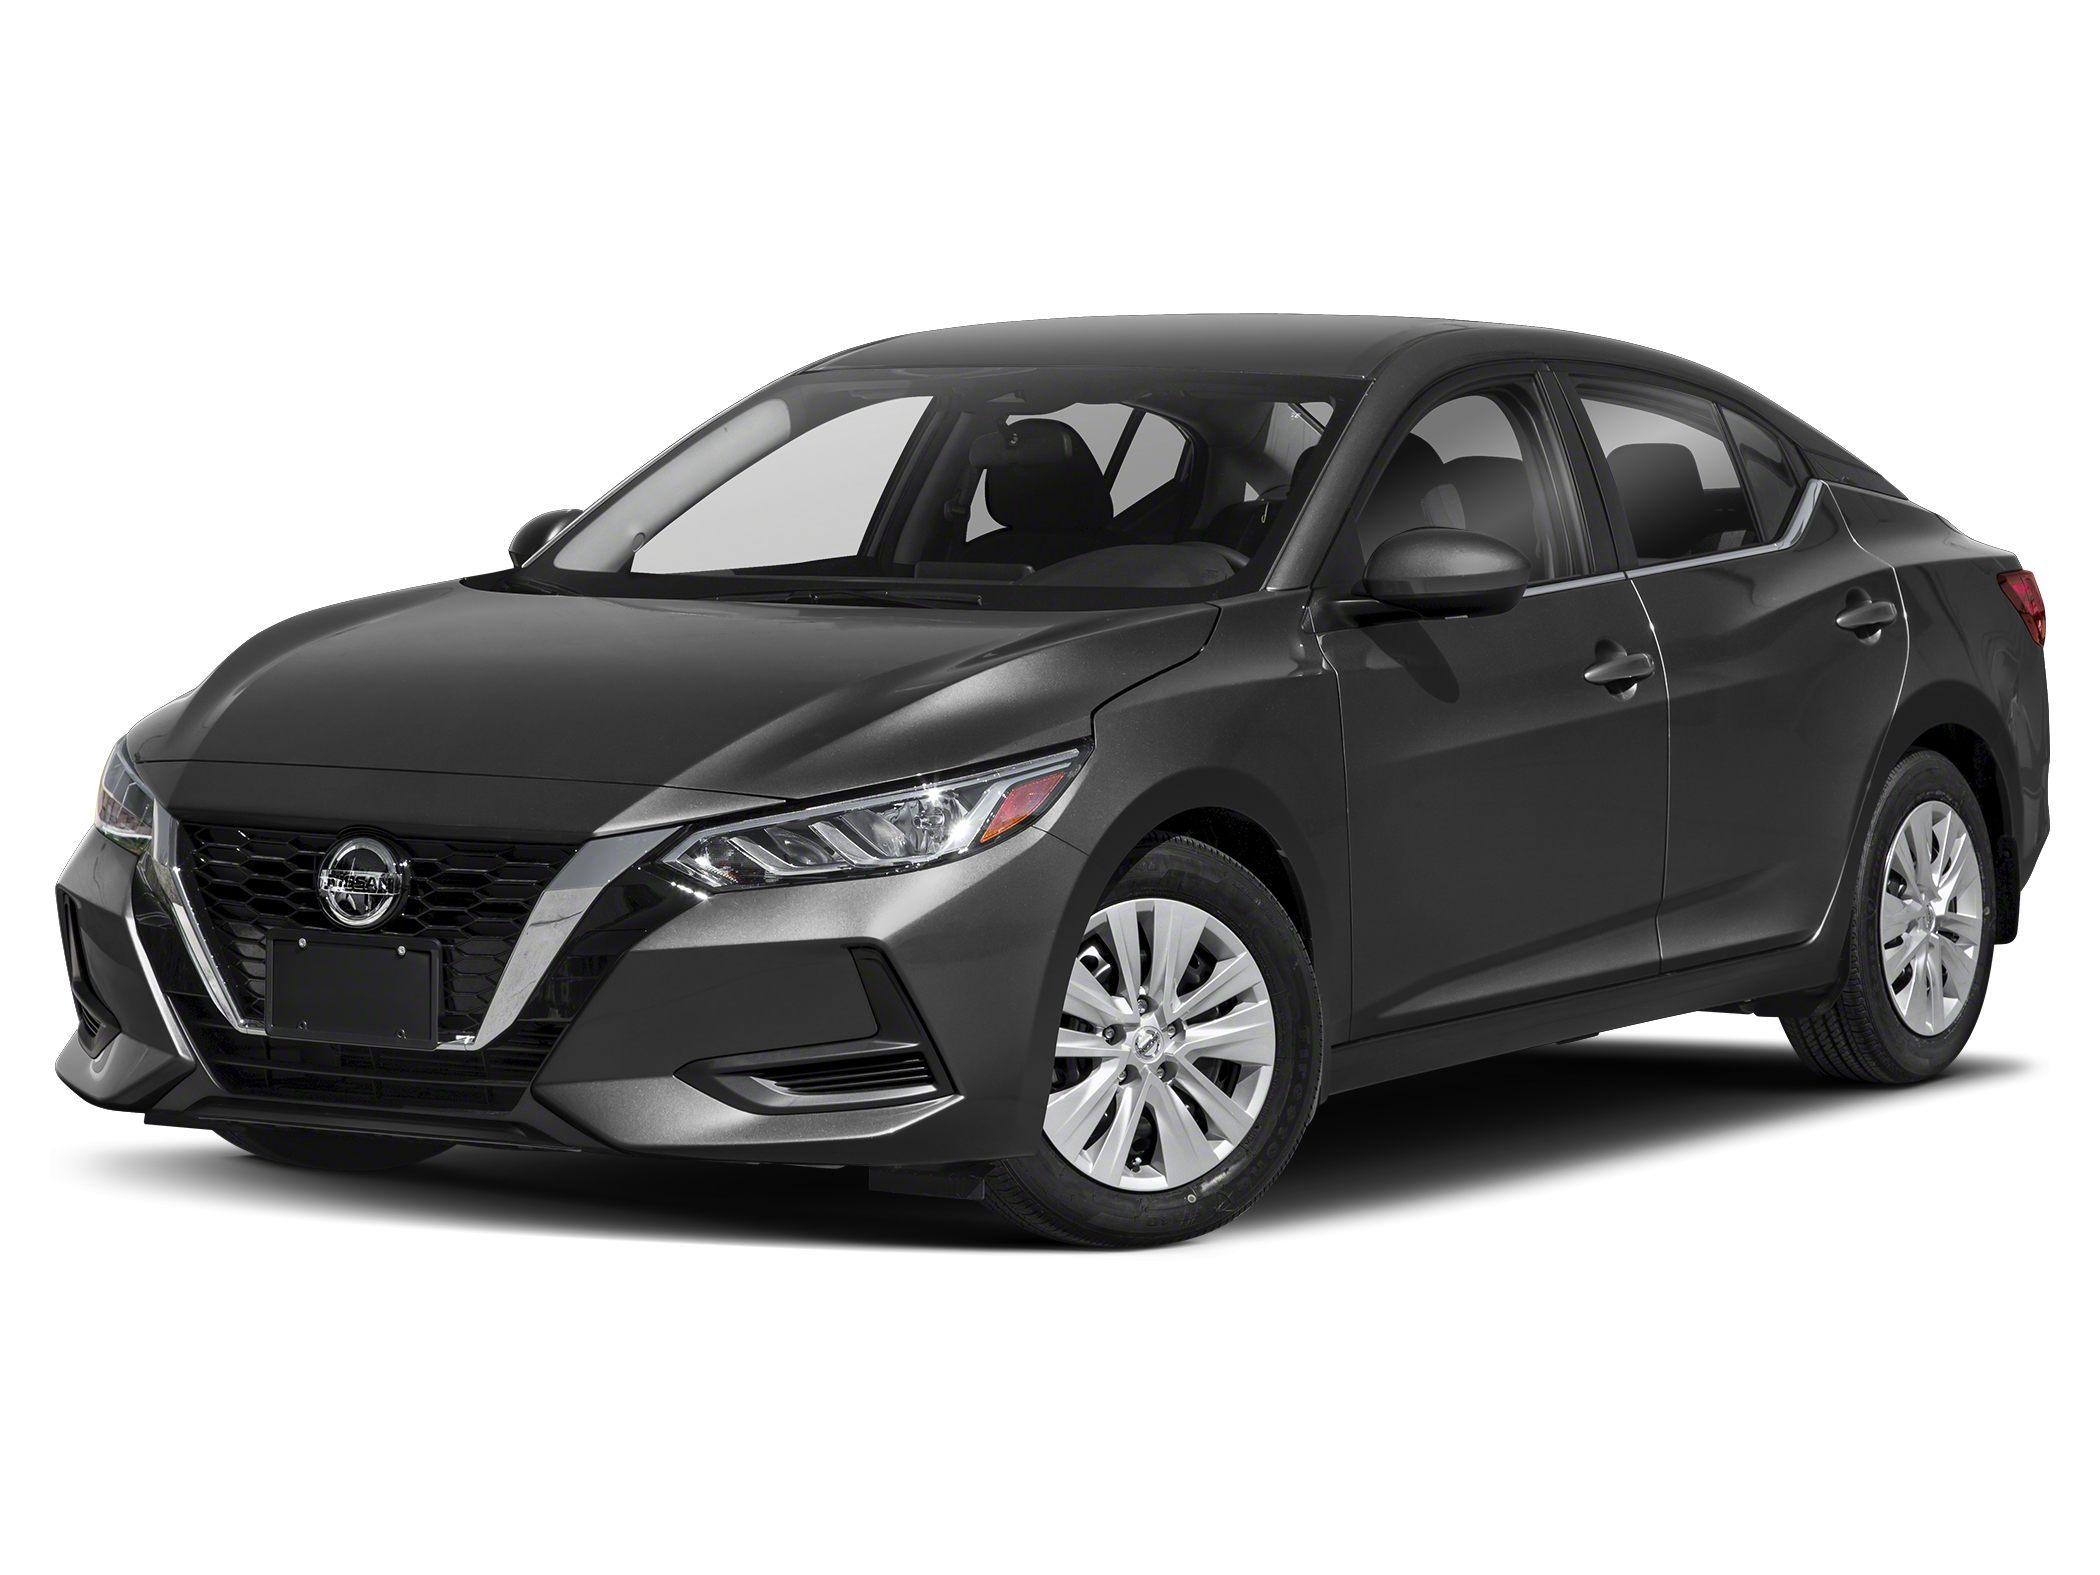 2021 Nissan Sentra Sedan